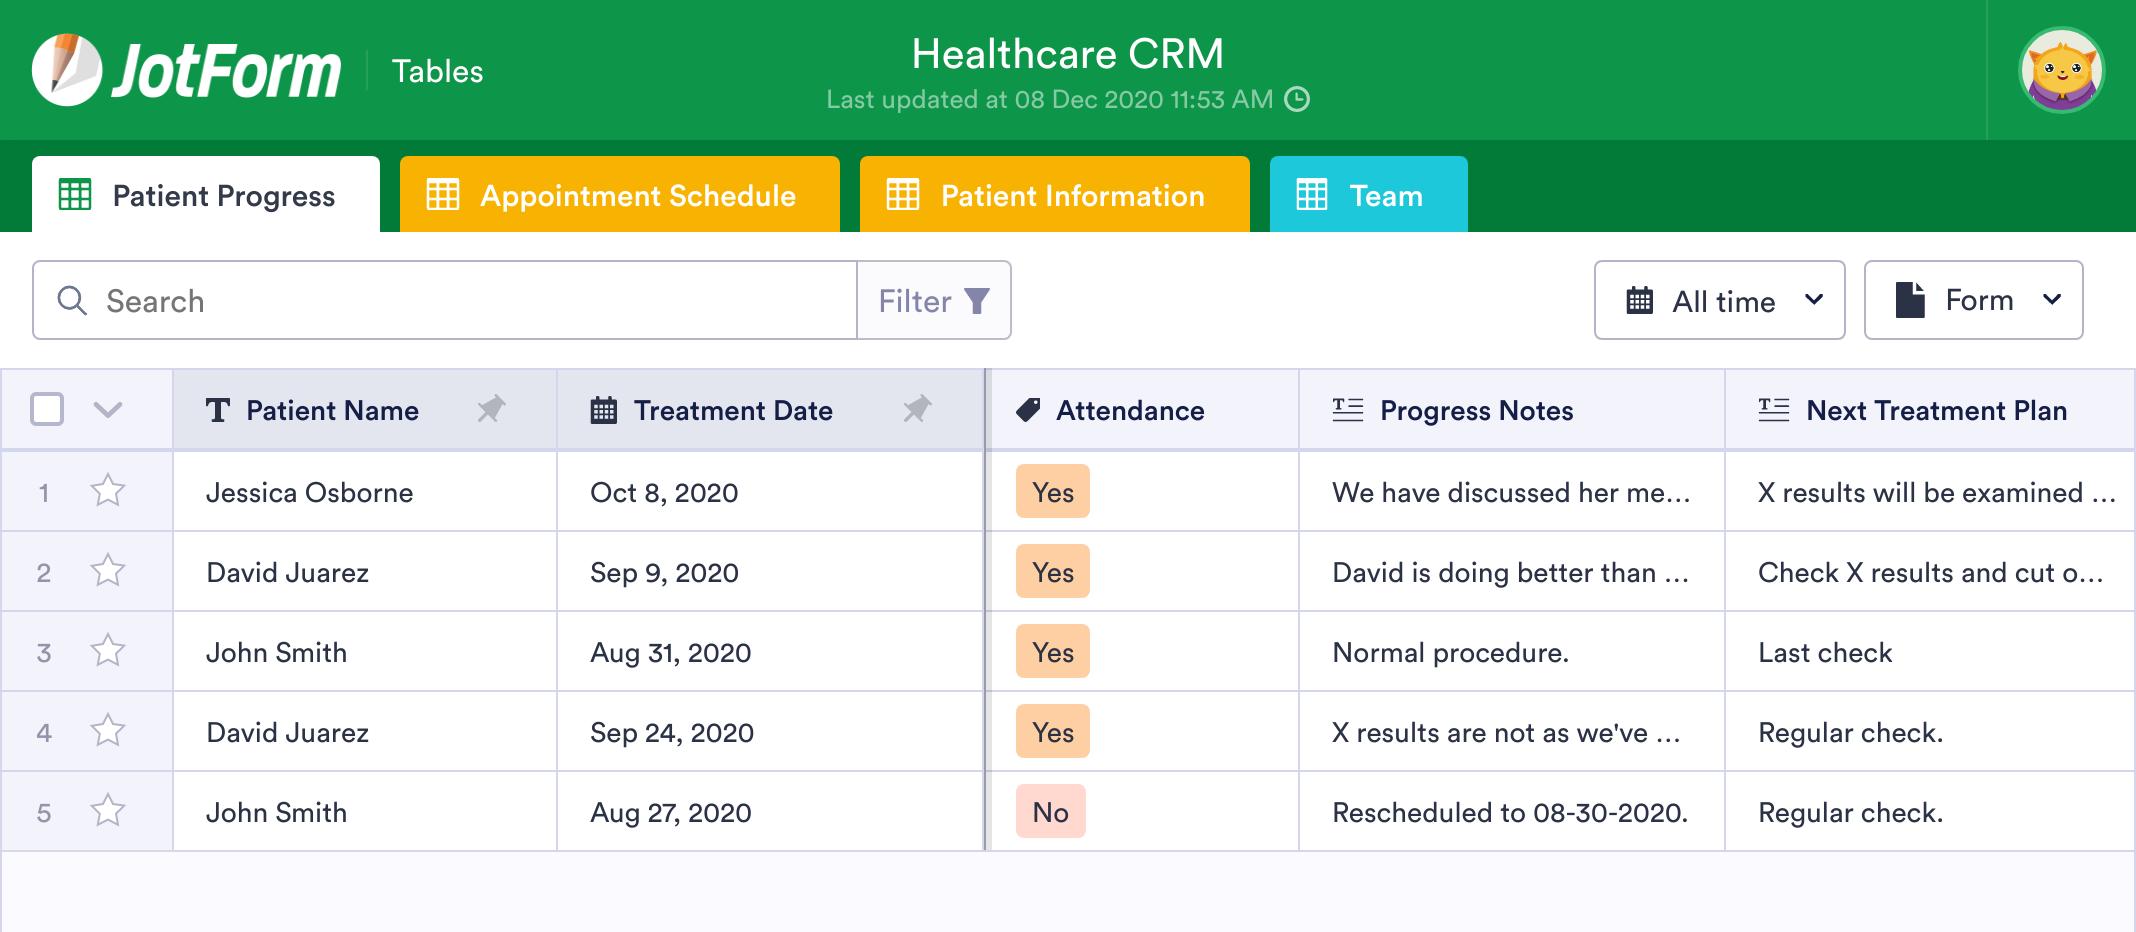 Healthcare CRM